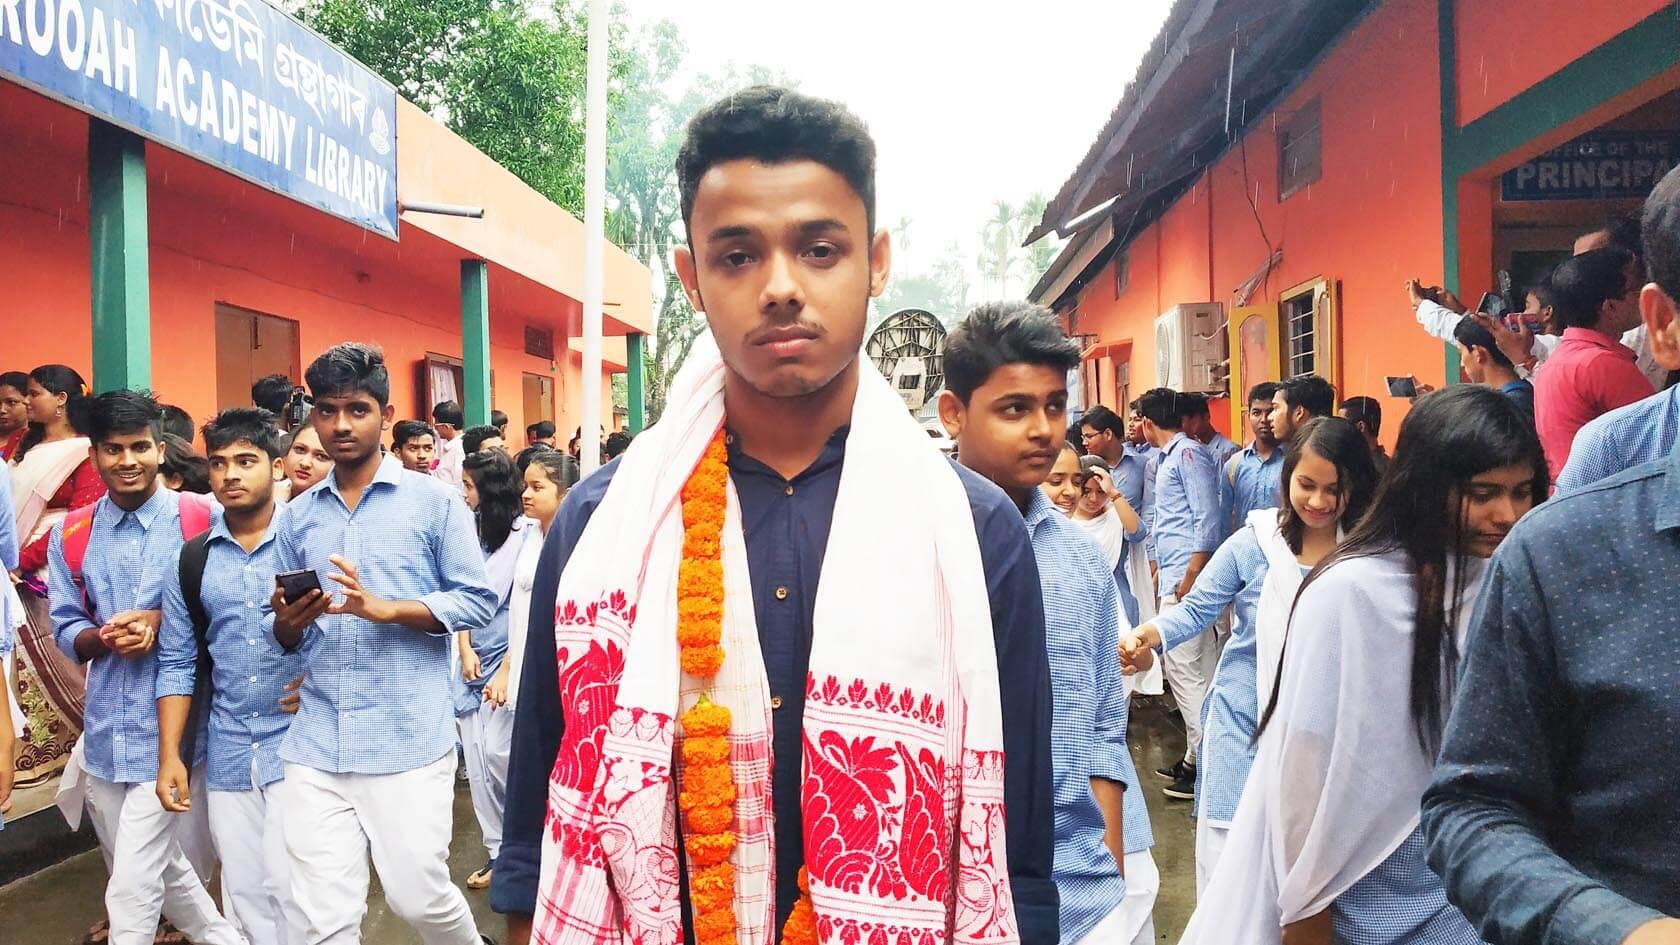 One from Pathsala Anundoram Borooah Academy College, Abhilesh Thakuriya among rank holders